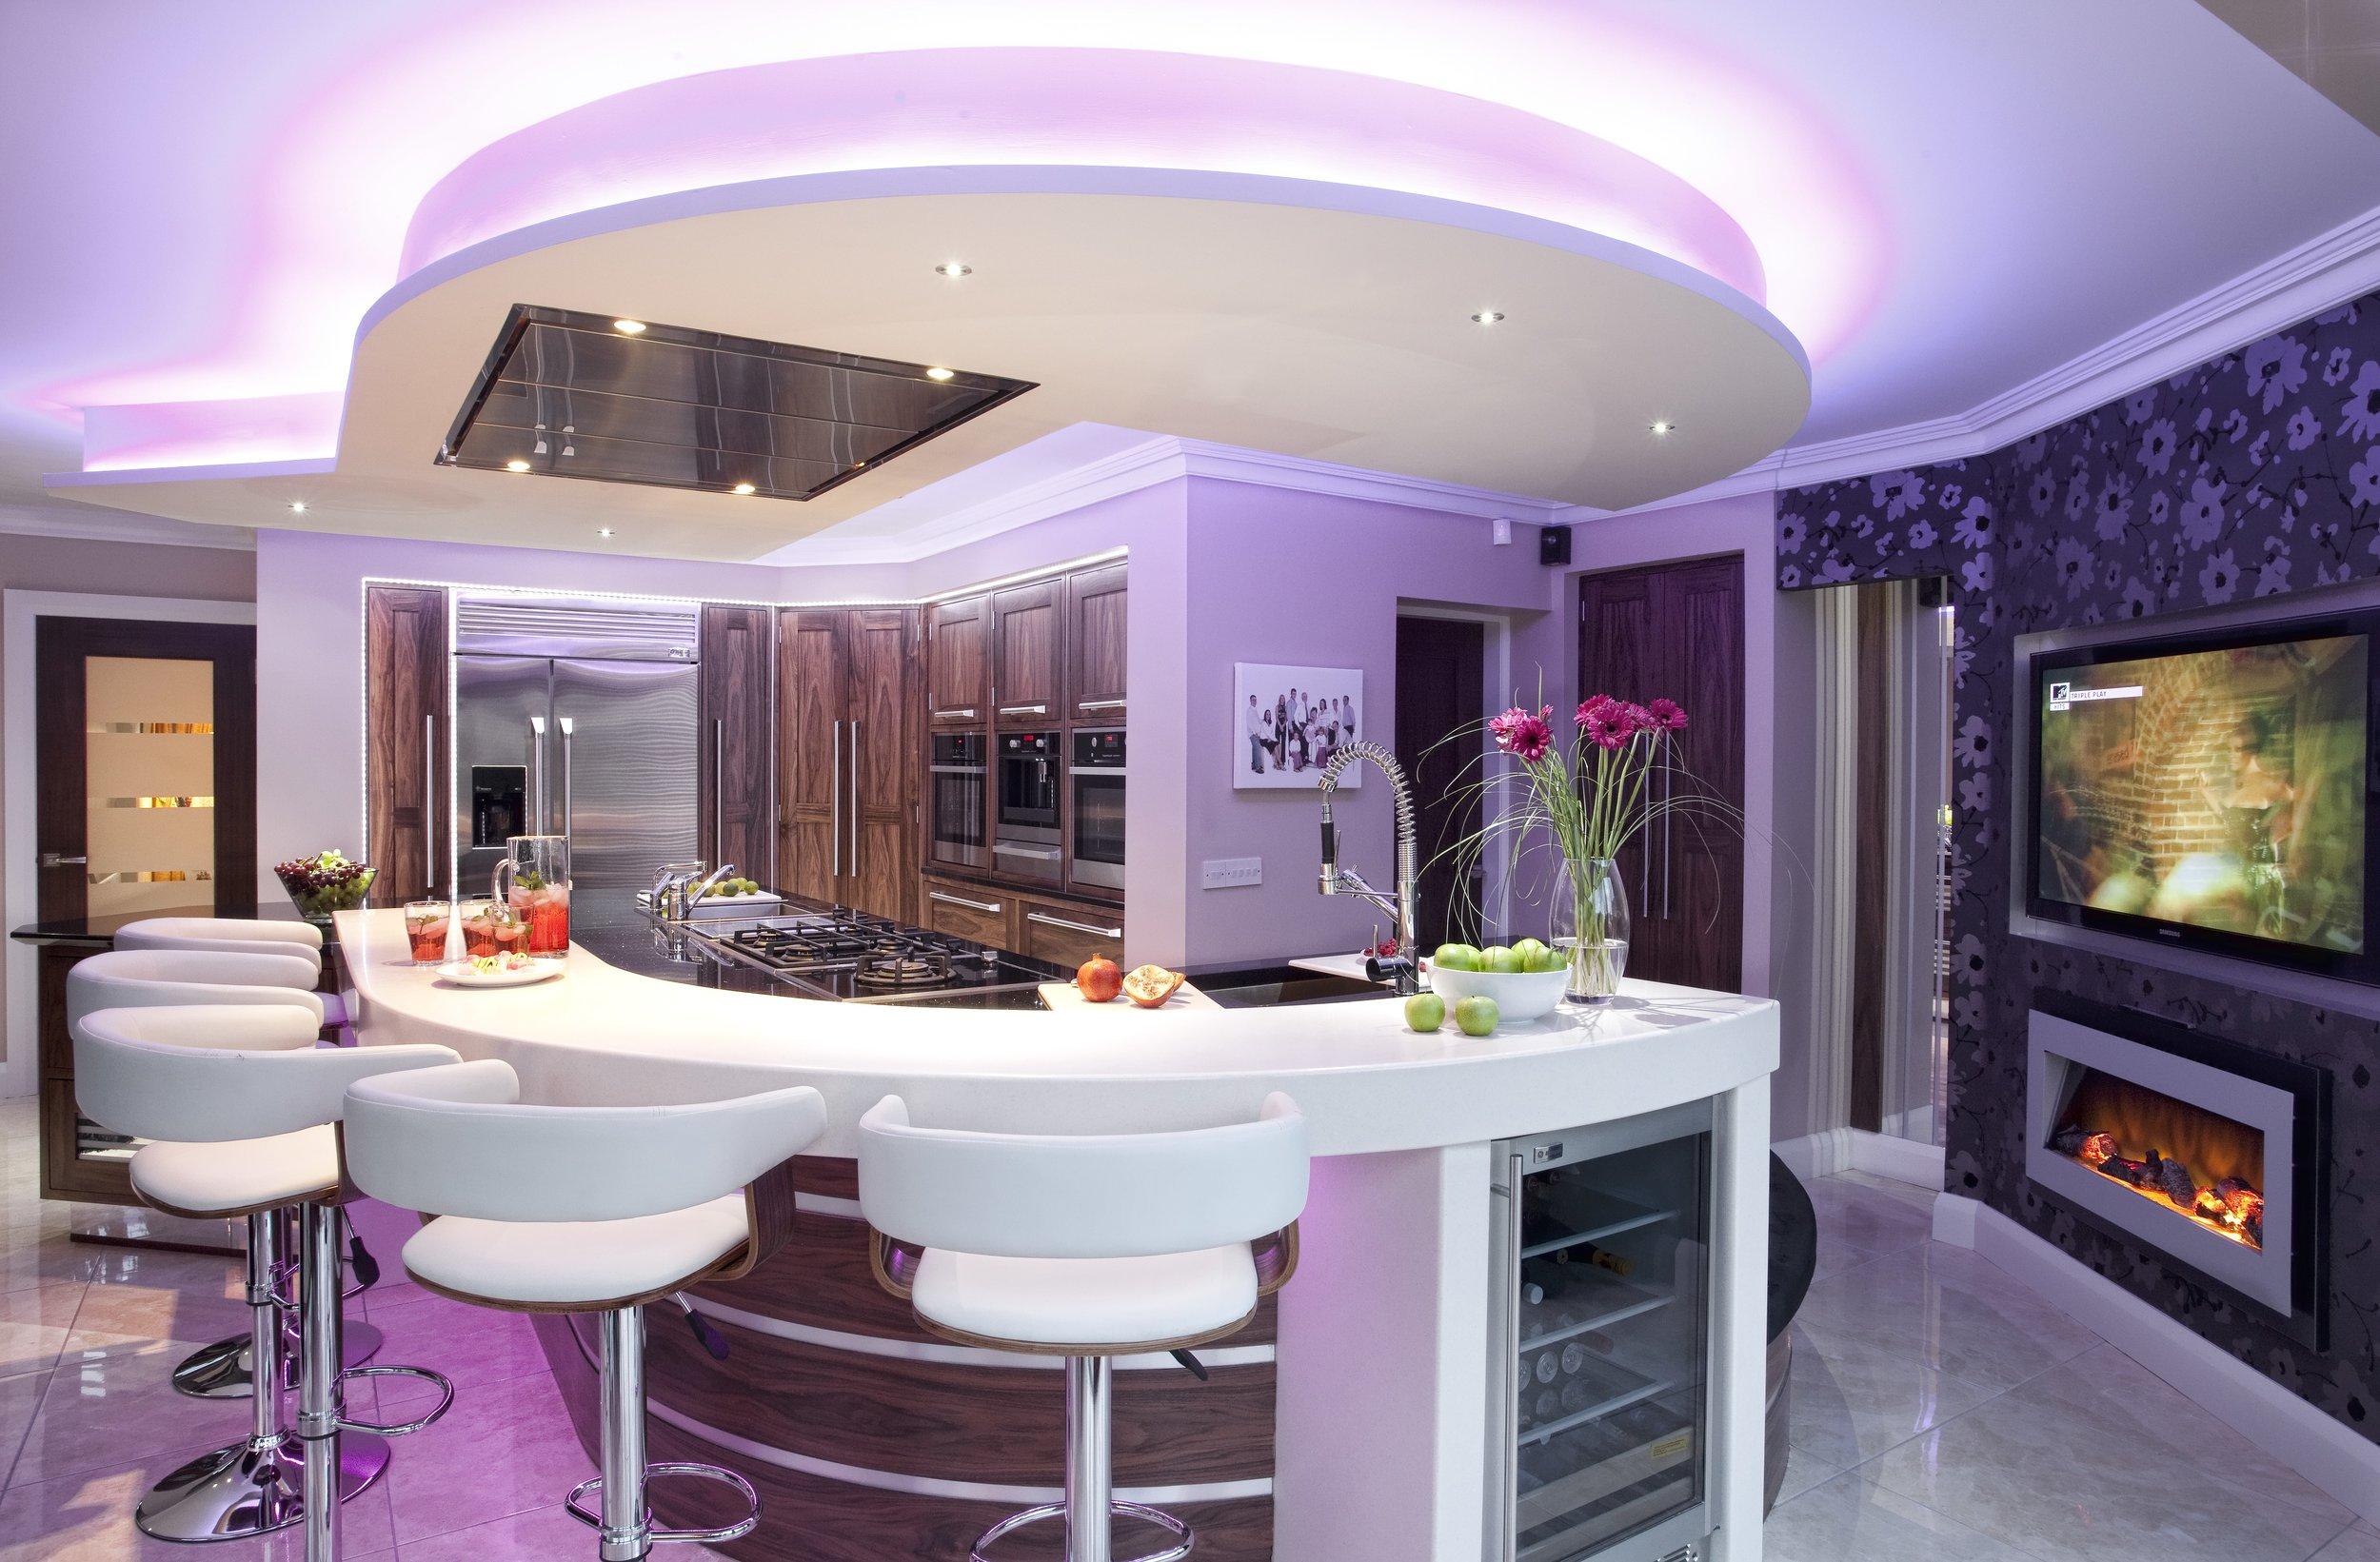 SH -002 -Walnut kitchen.jpg